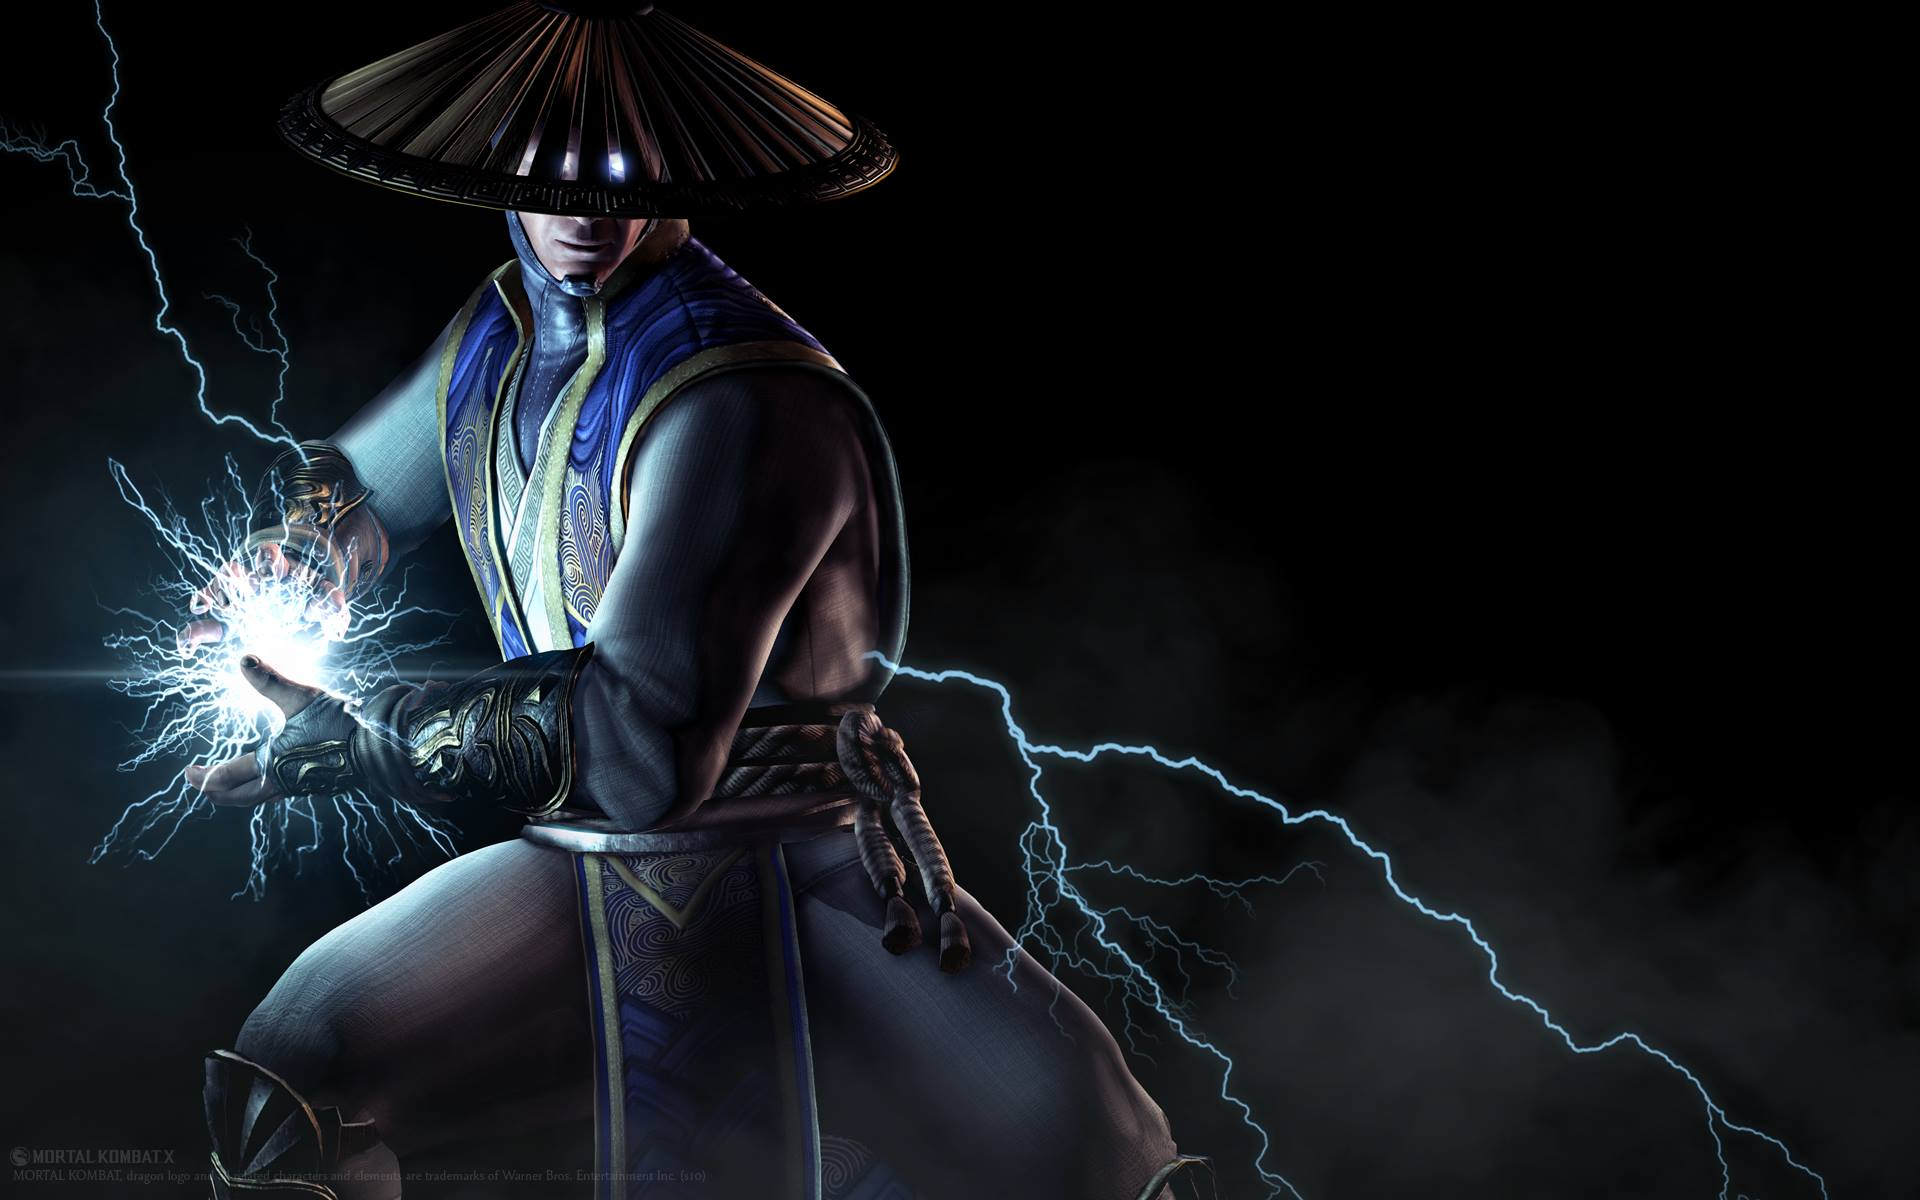 Mortal Kombat X Raiden WallpaperMortal Kombat 10 Raiden